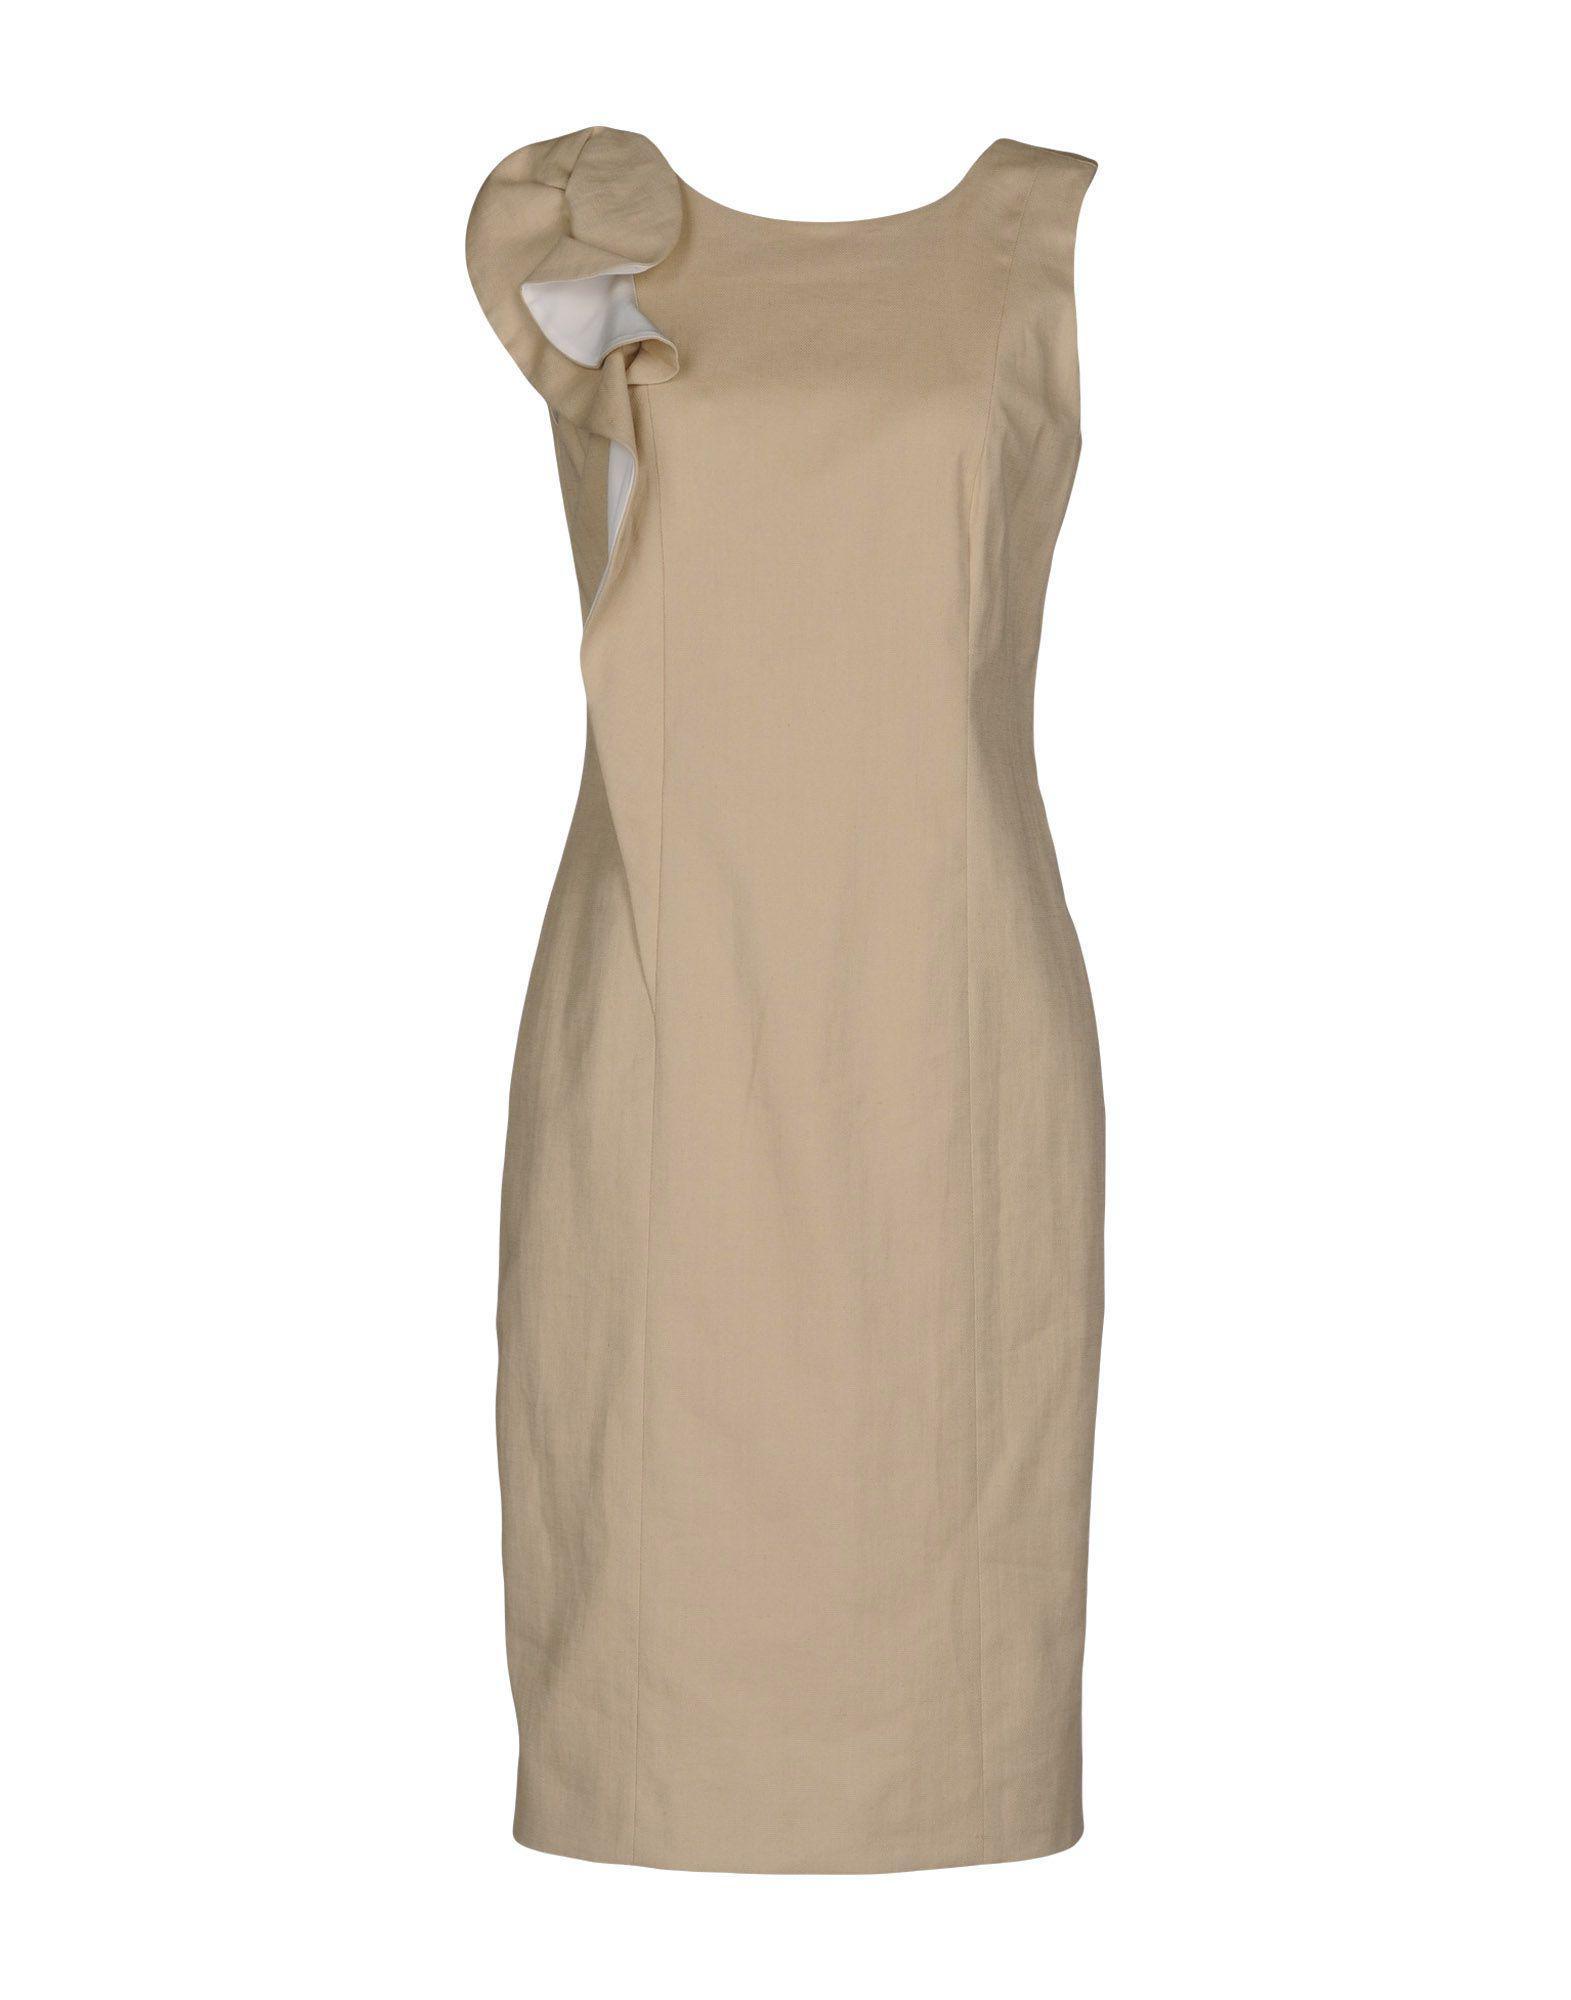 DRESSES - Long dresses Fabrizio Lenzi shRnnI